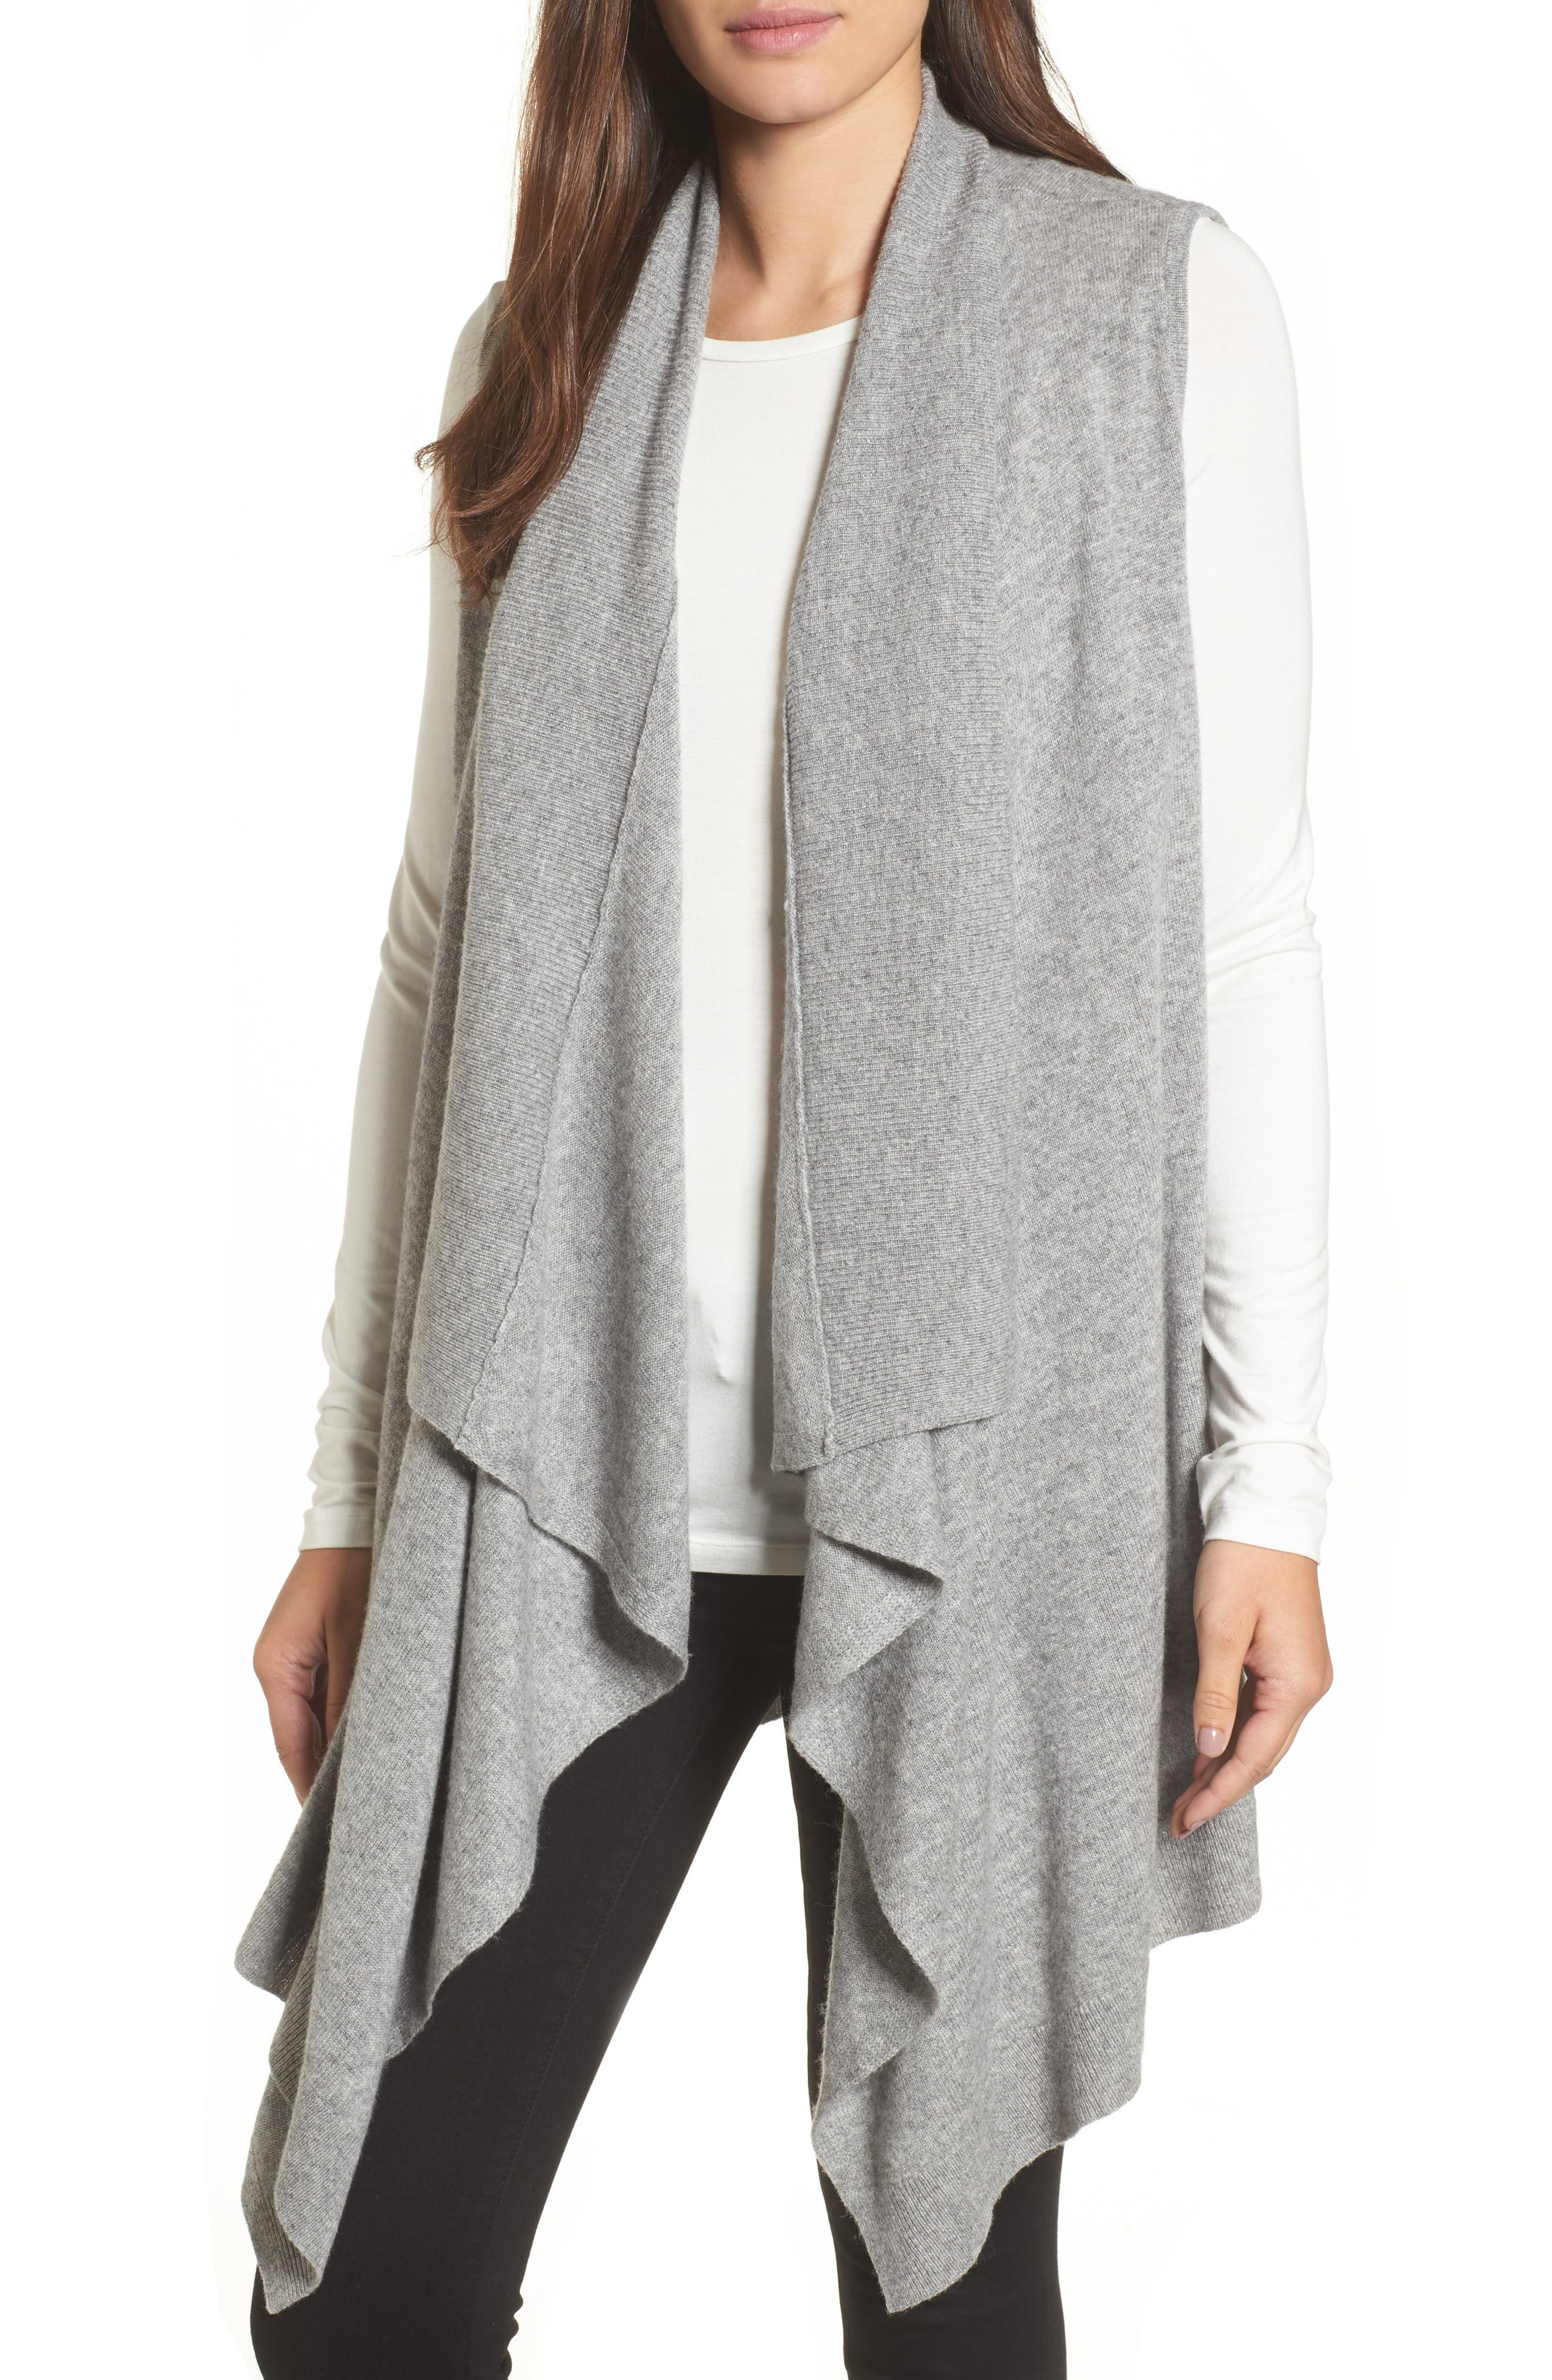 Main Image - Halogen® Wool & Cashmere Drape Front Sweater Vest